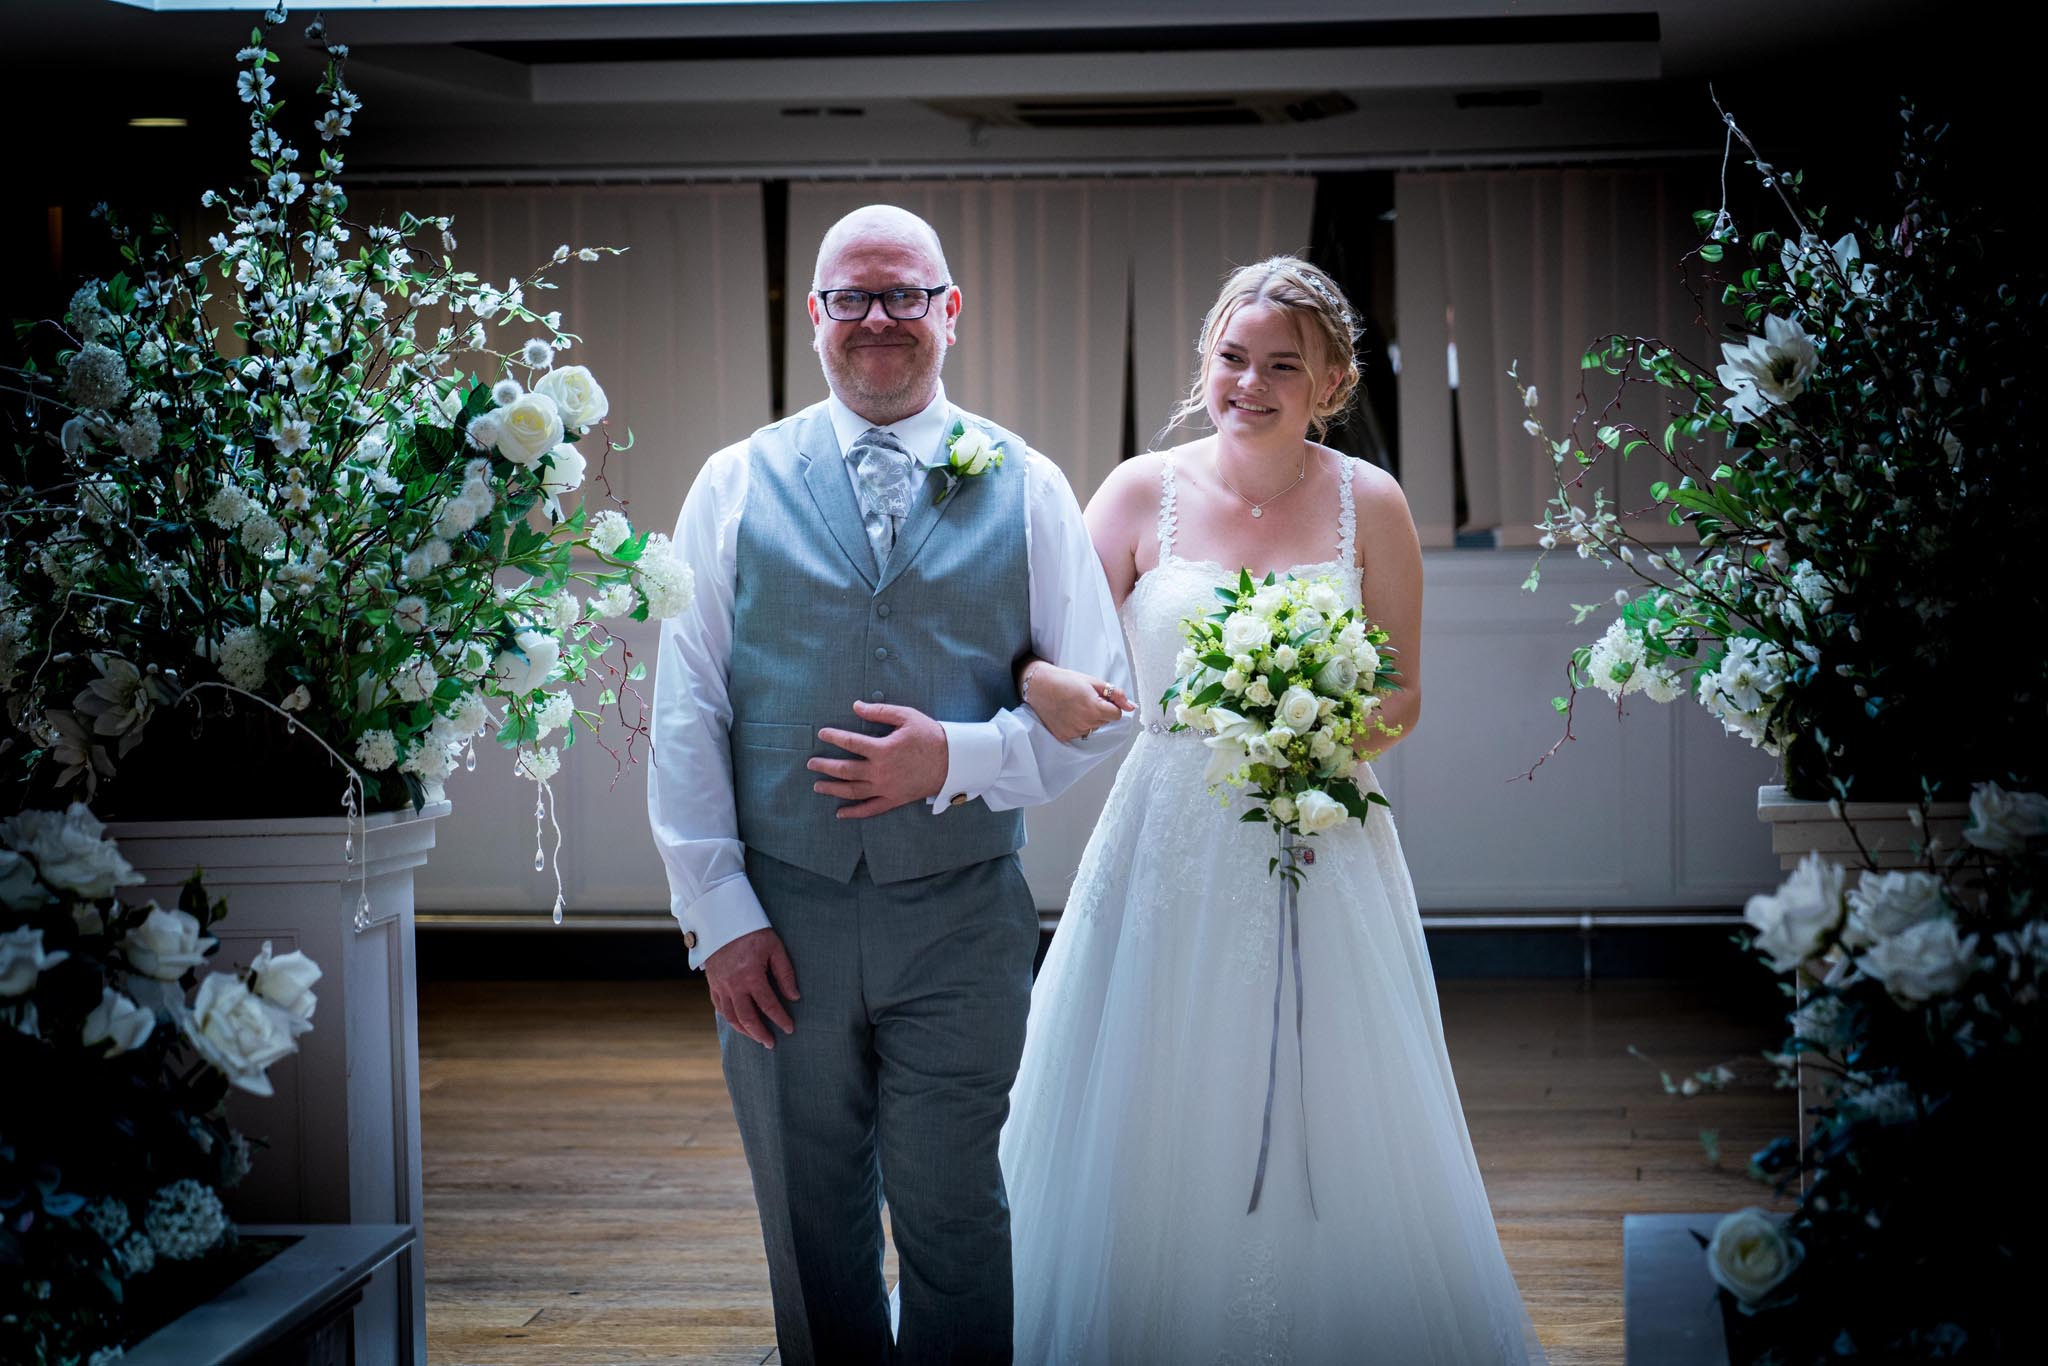 284-Ceremony-Luke-Yasmin-The-Rayleigh-Club-Wedding-Photography.jpg